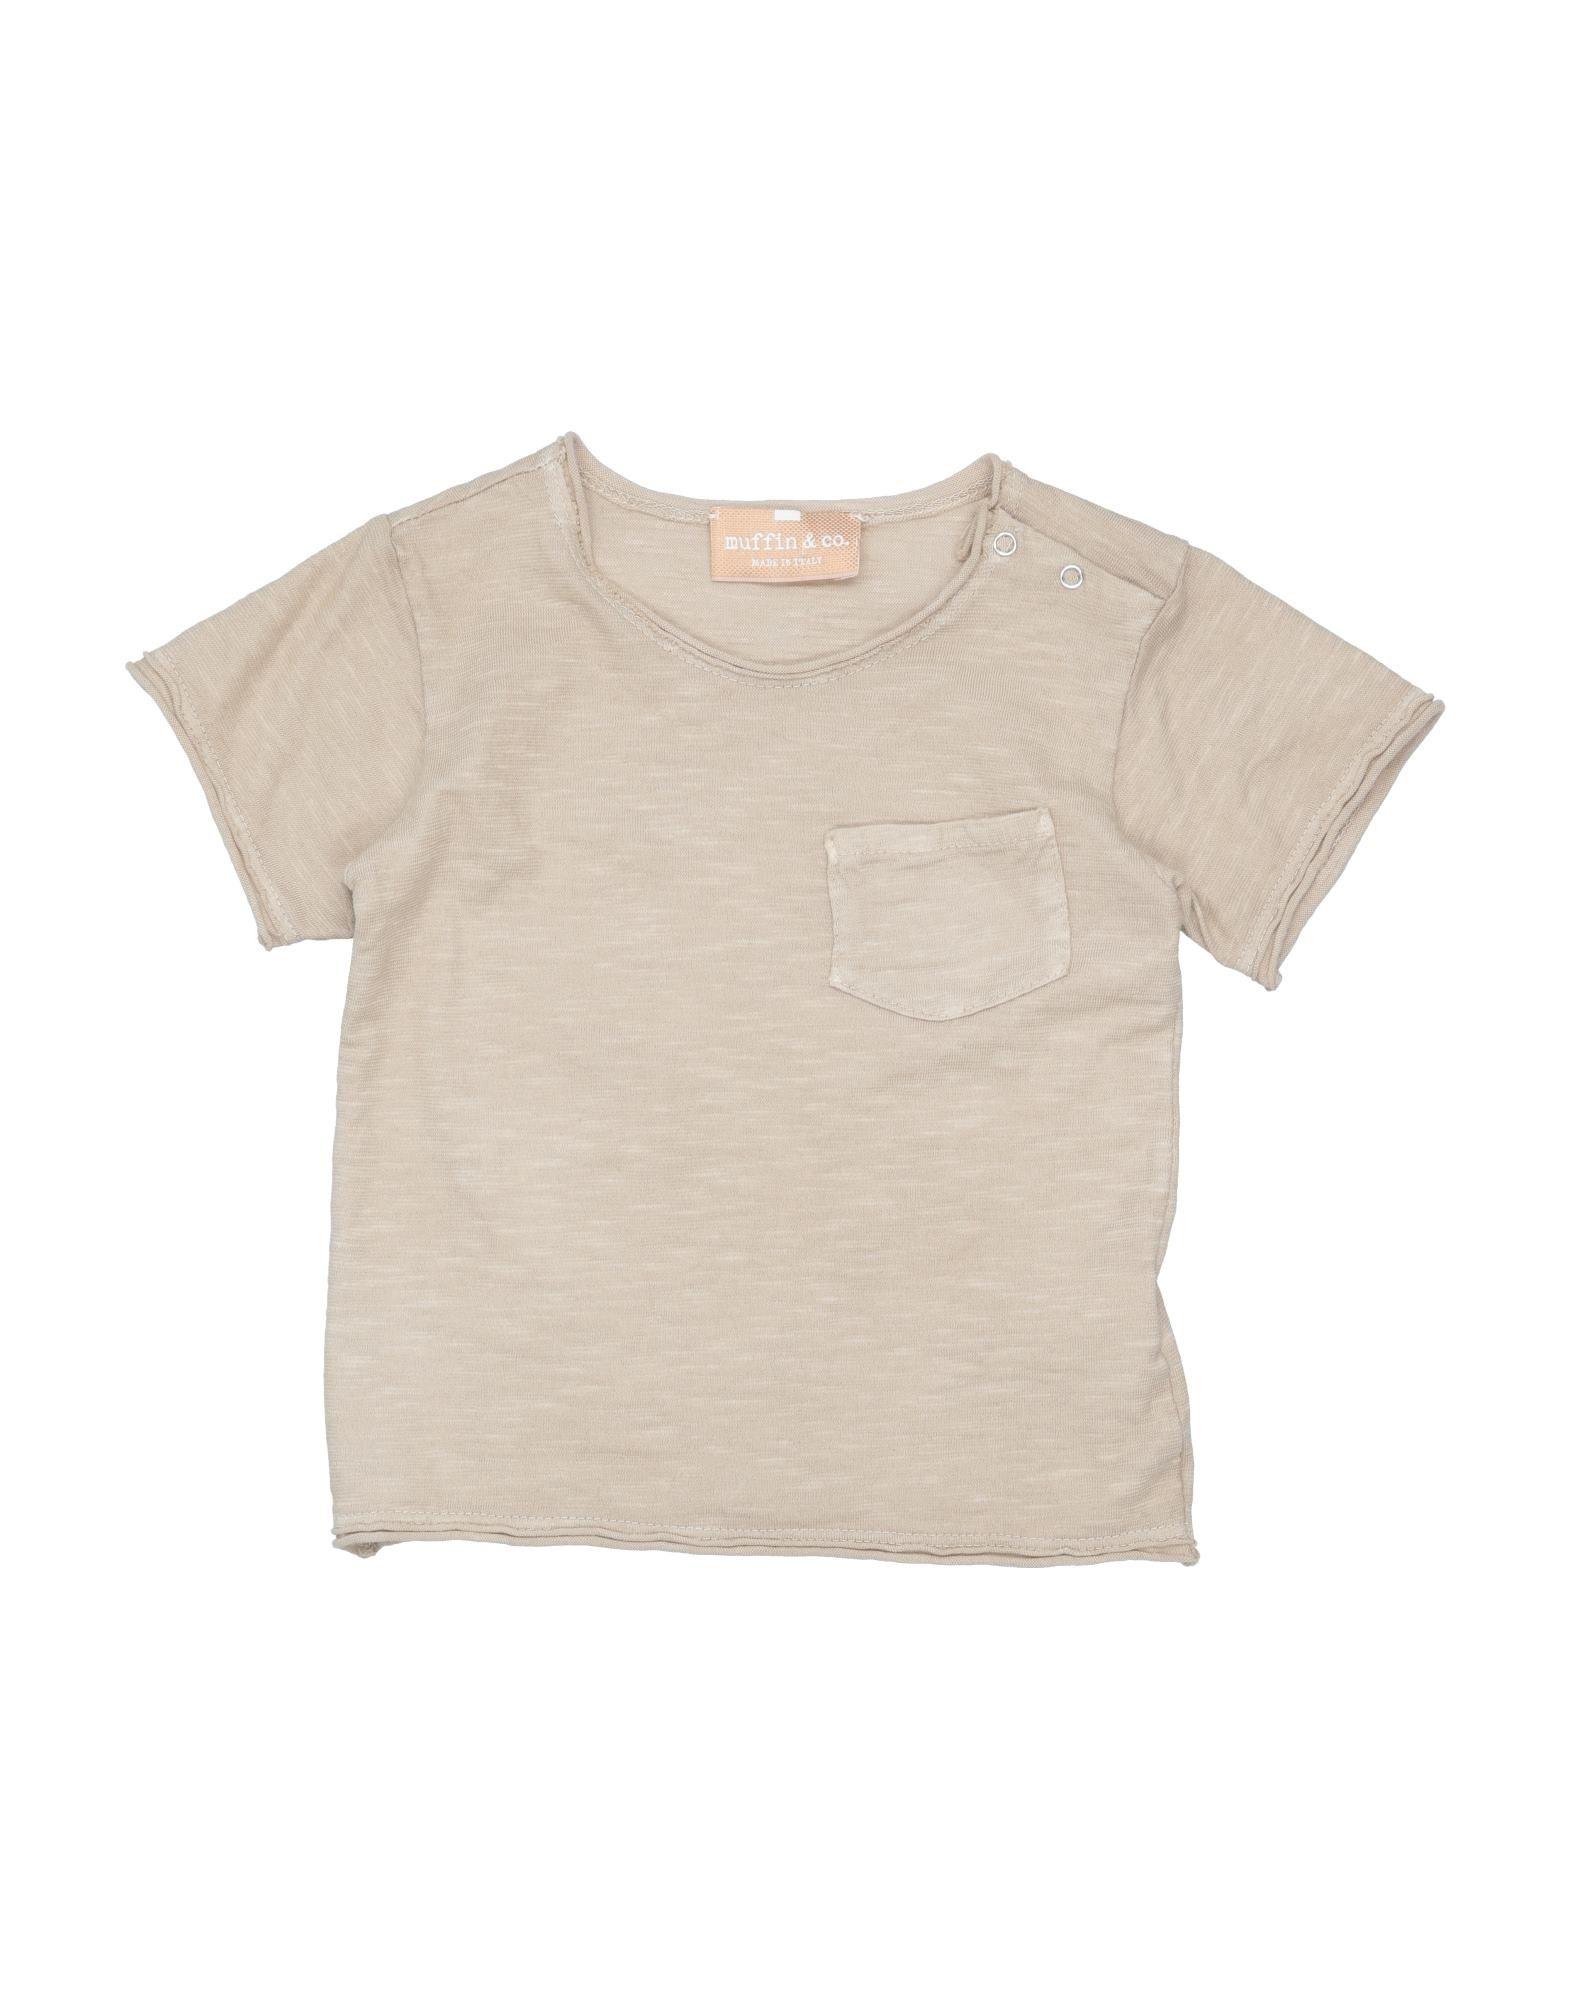 Muffin & Co. Kids' T-shirts In Beige